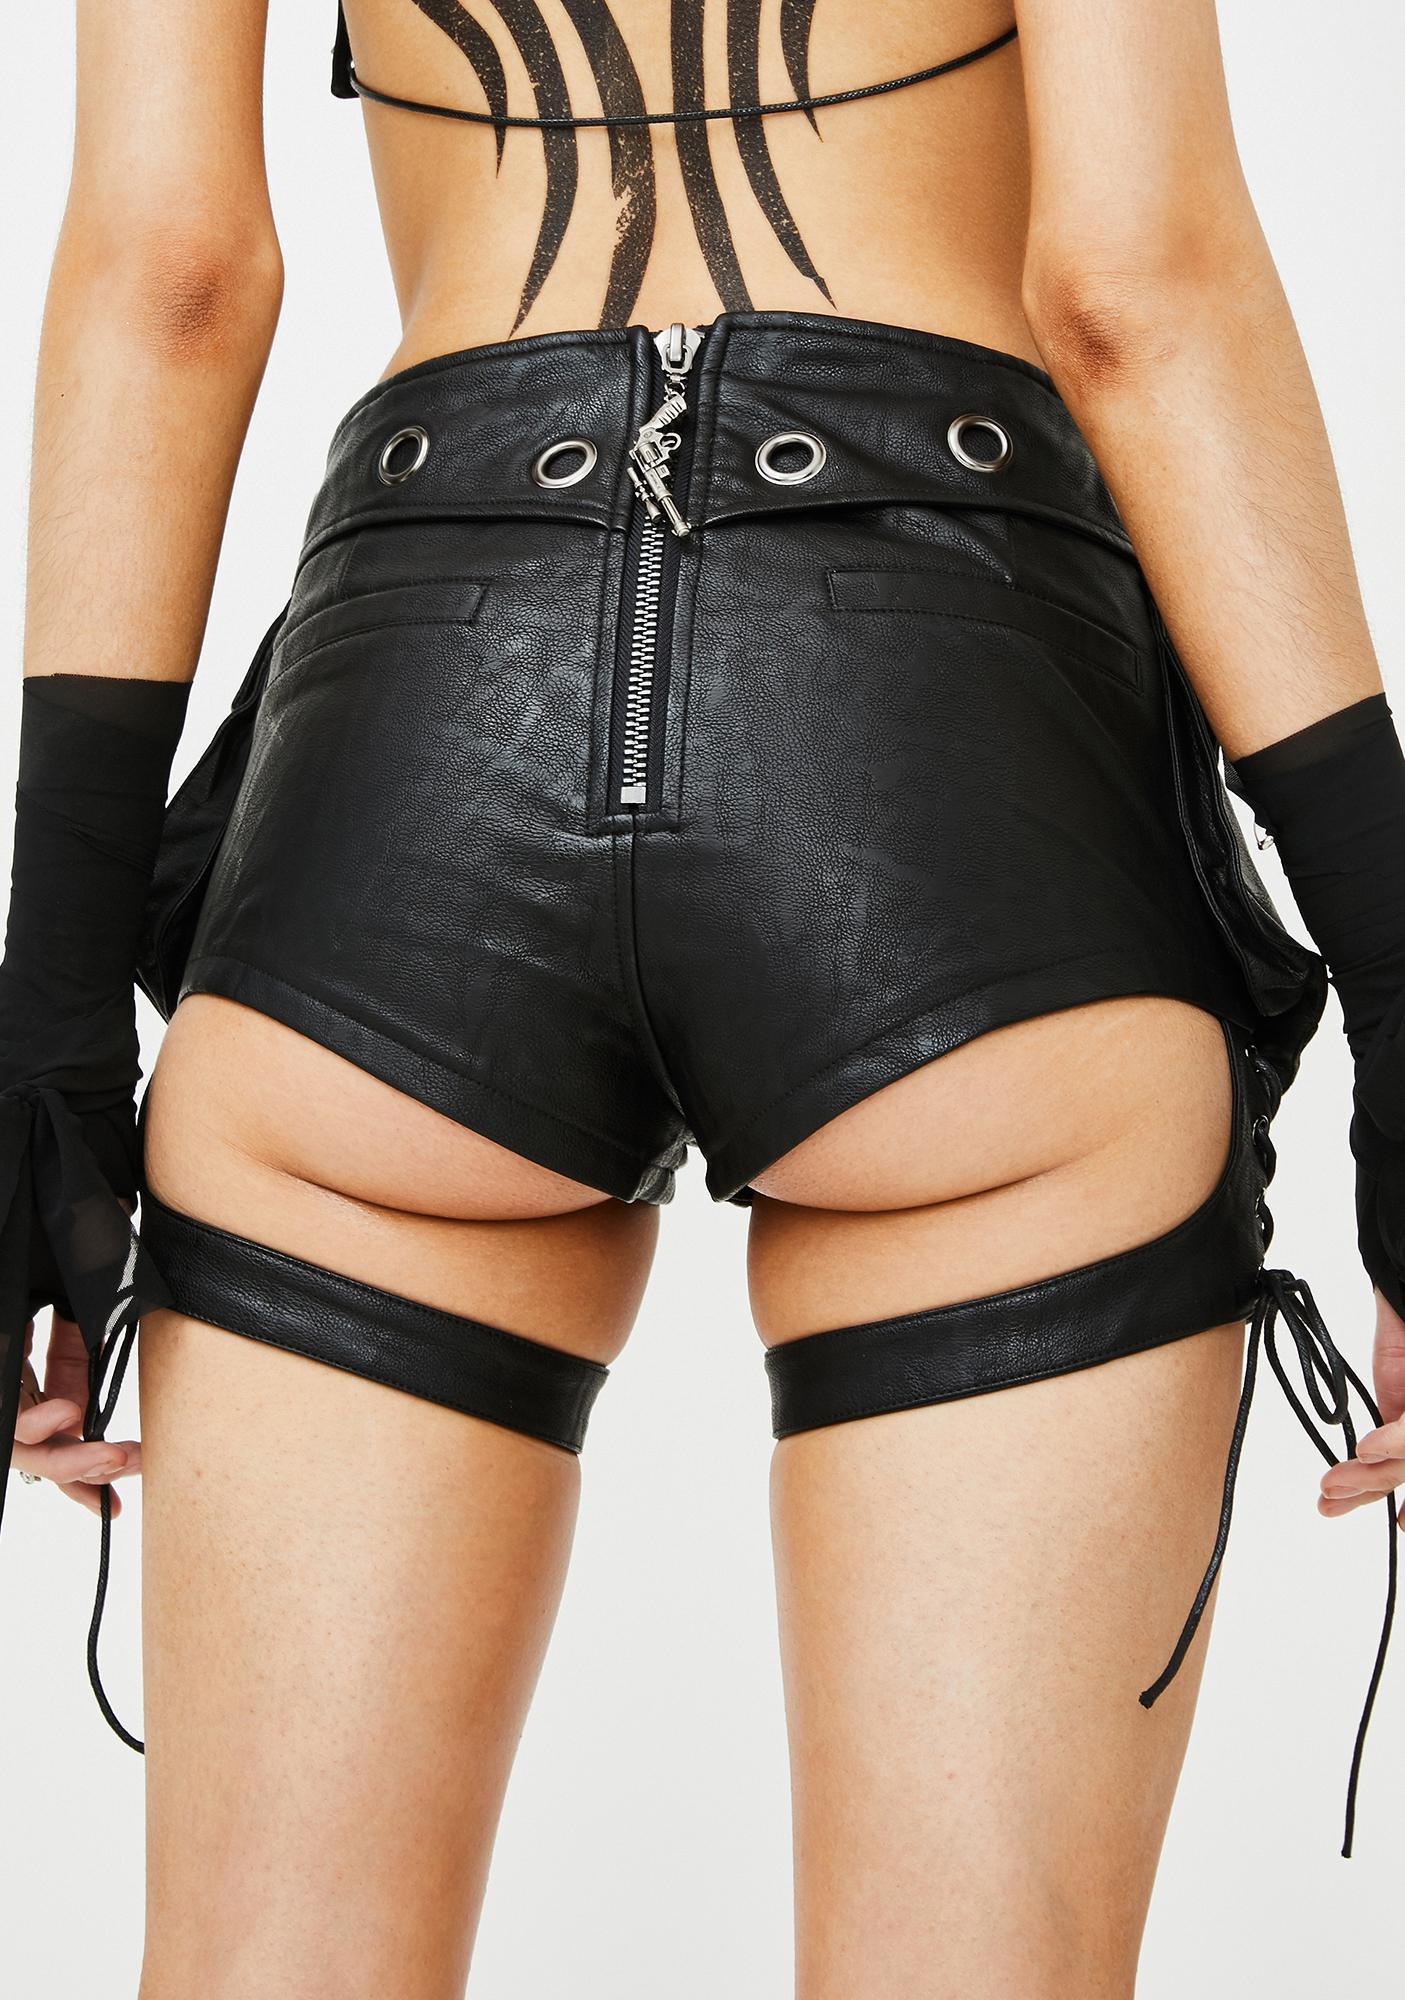 Punk Rave Lace-Up Garter Bag Shorts